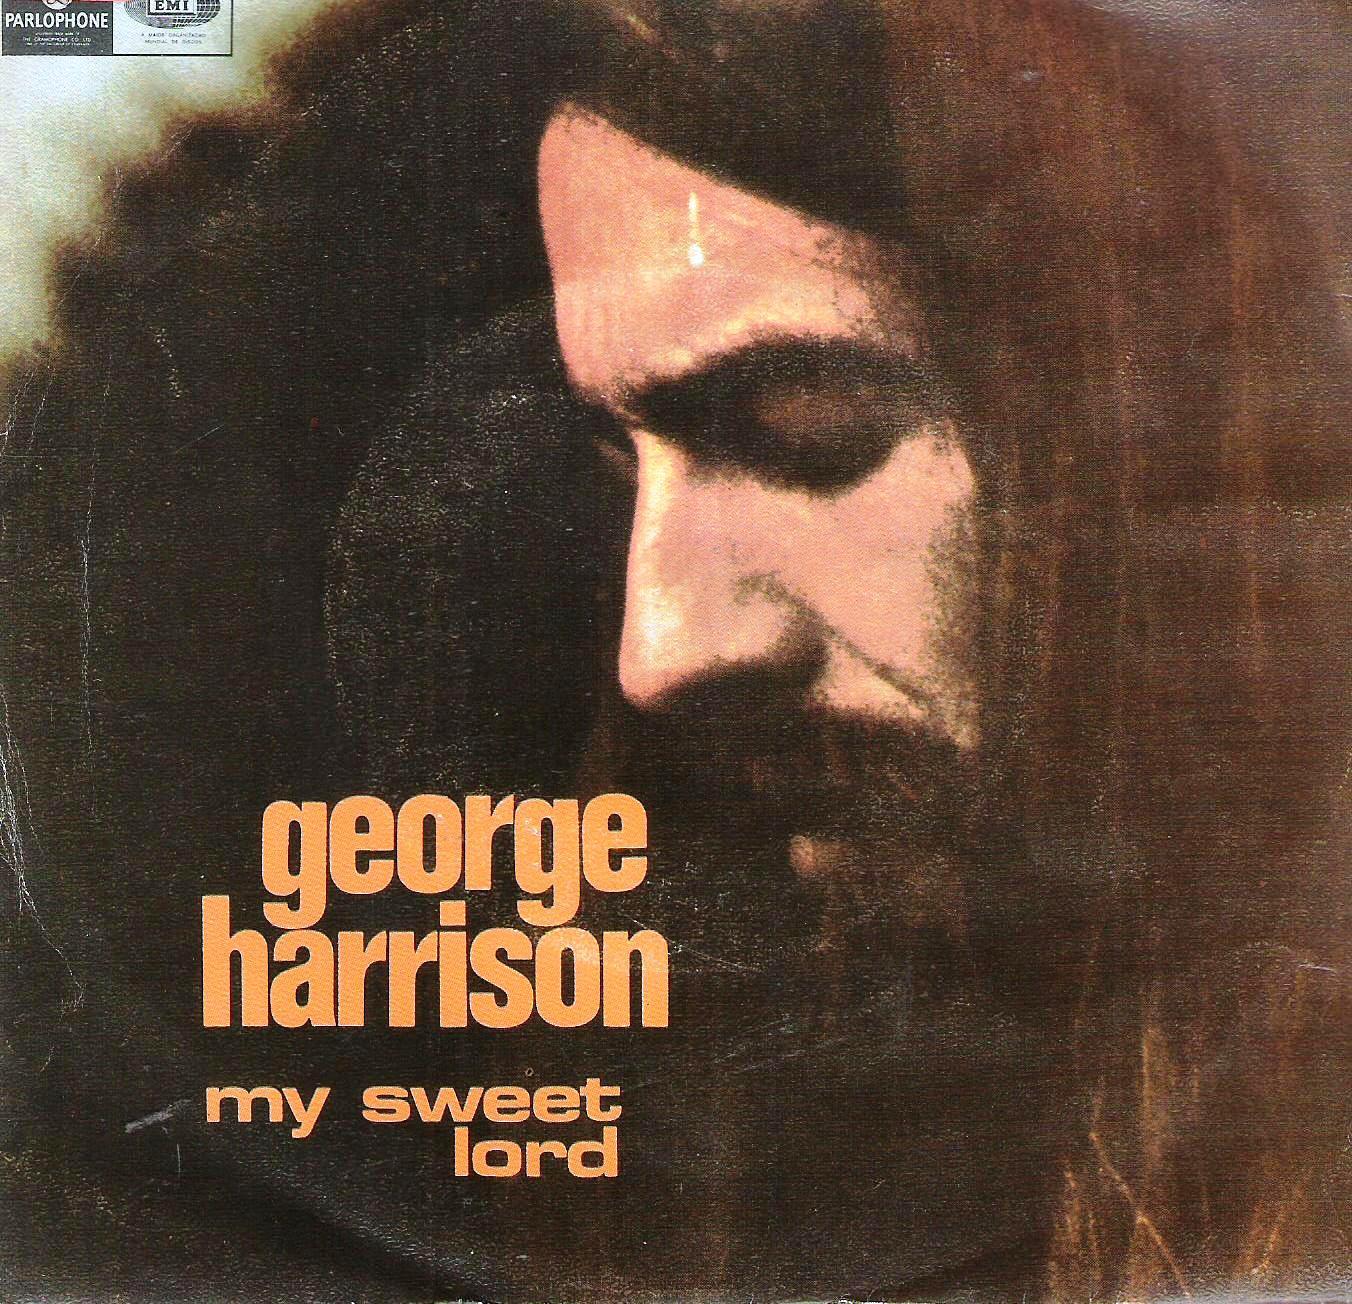 george-harrison-my-sweet-lord-1970-1975-years